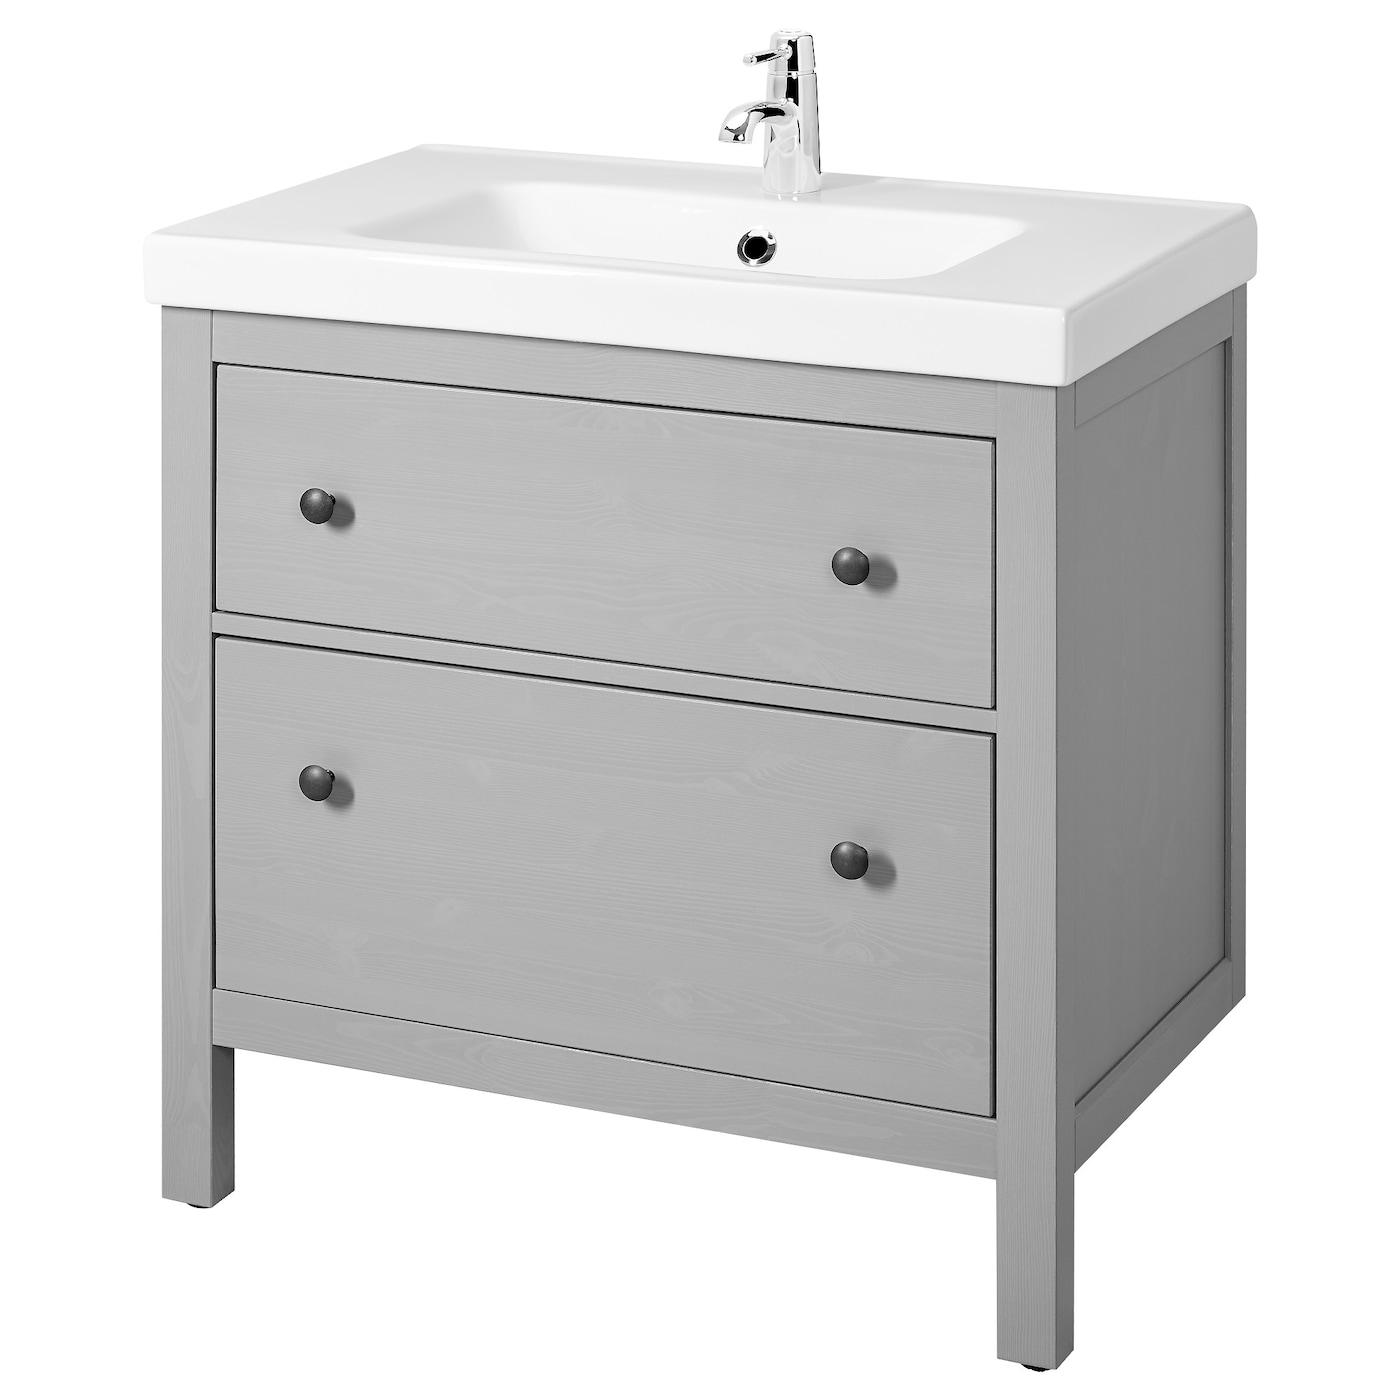 "HEMNES / ODENSVIK Bathroom vanity - gray 8 8/8x8 8/8x38 "" (8x8x8 cm)"